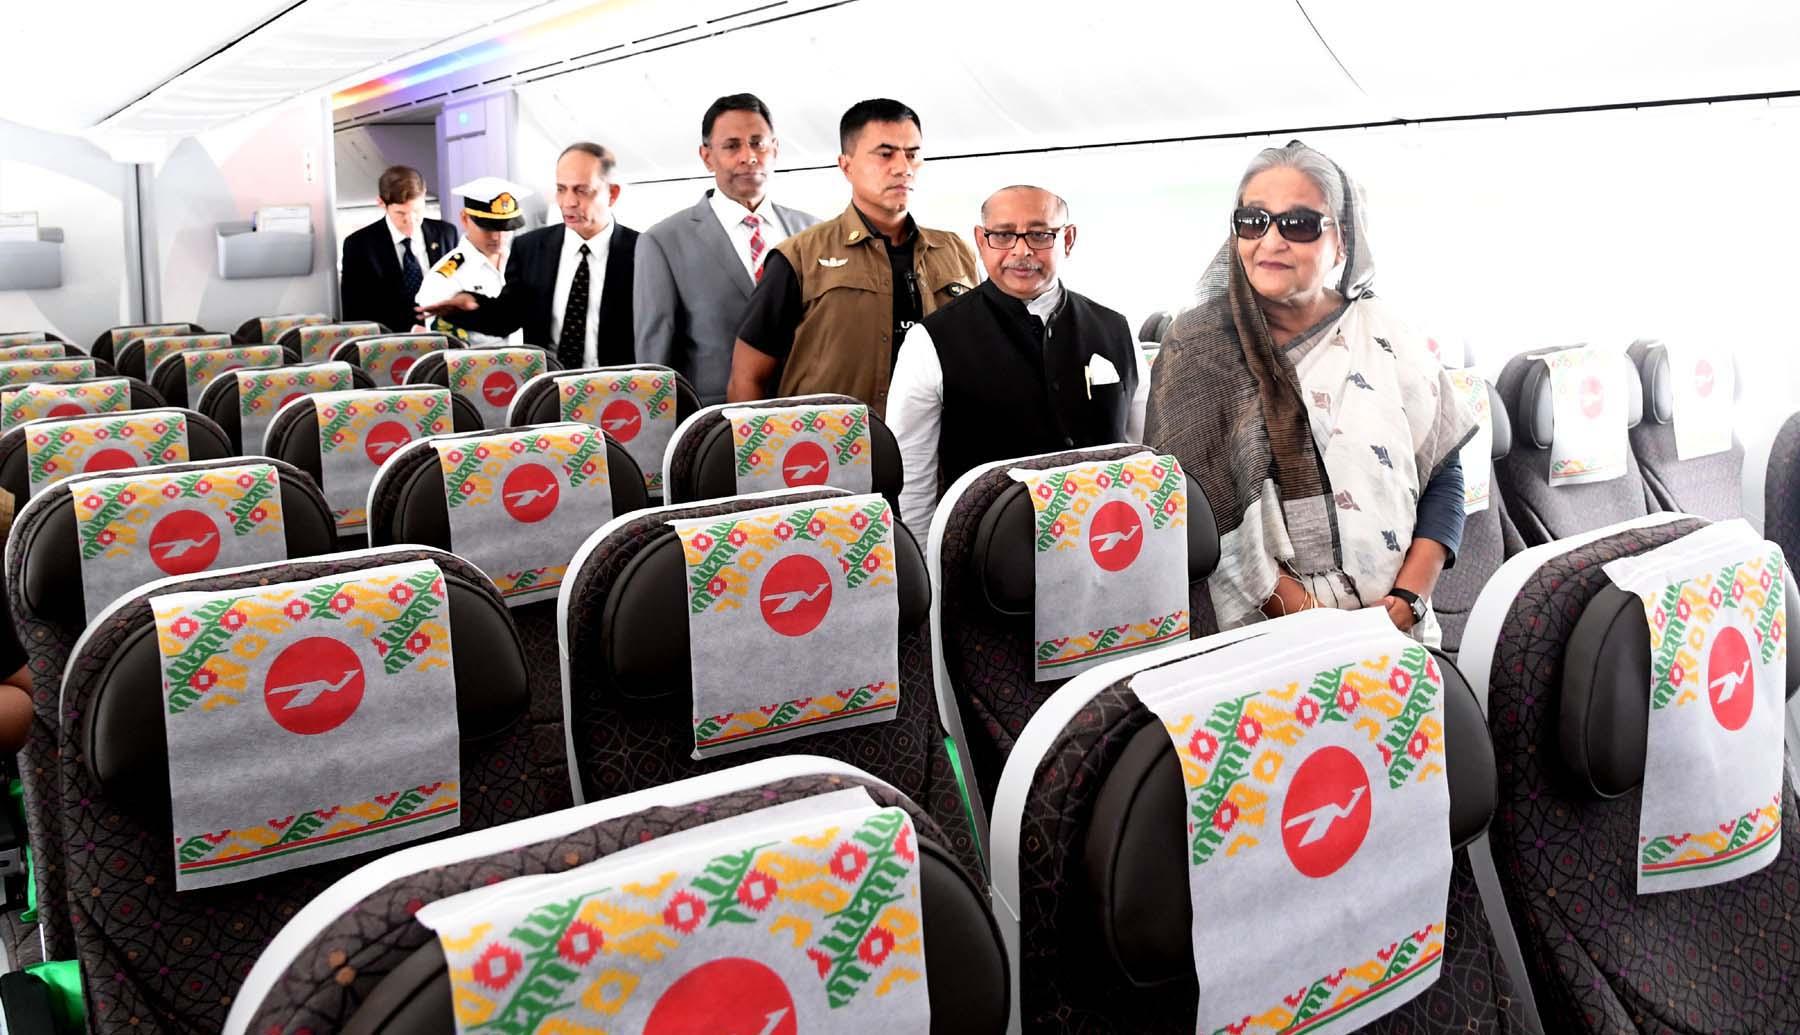 PM inaugurates third dreamliner 'Gaangchil'